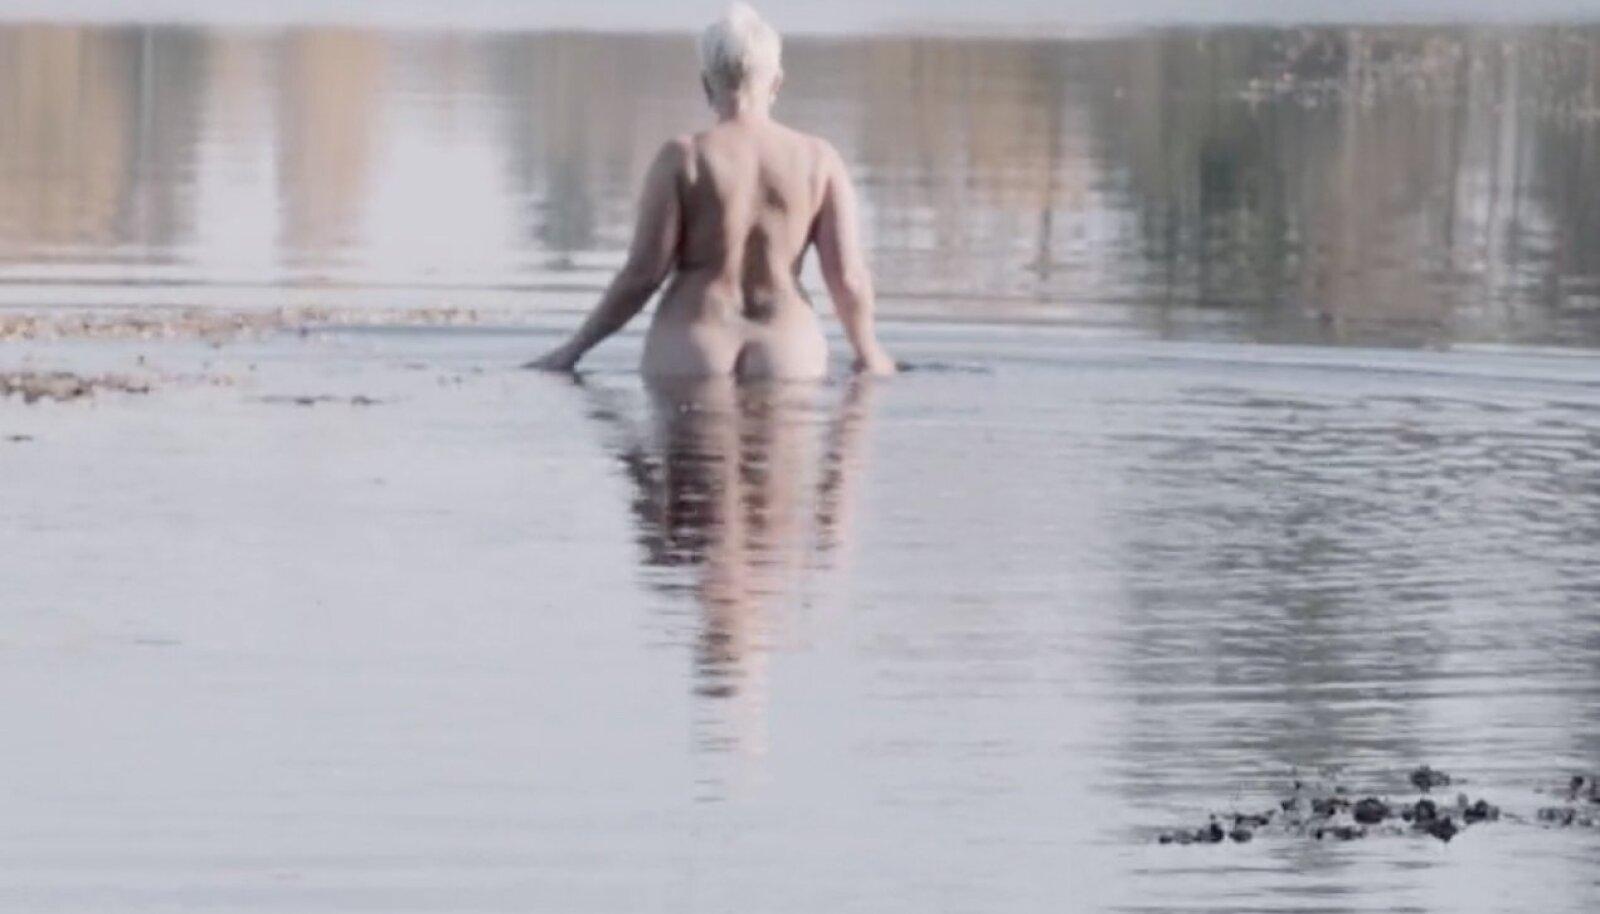 Evelin Ilves